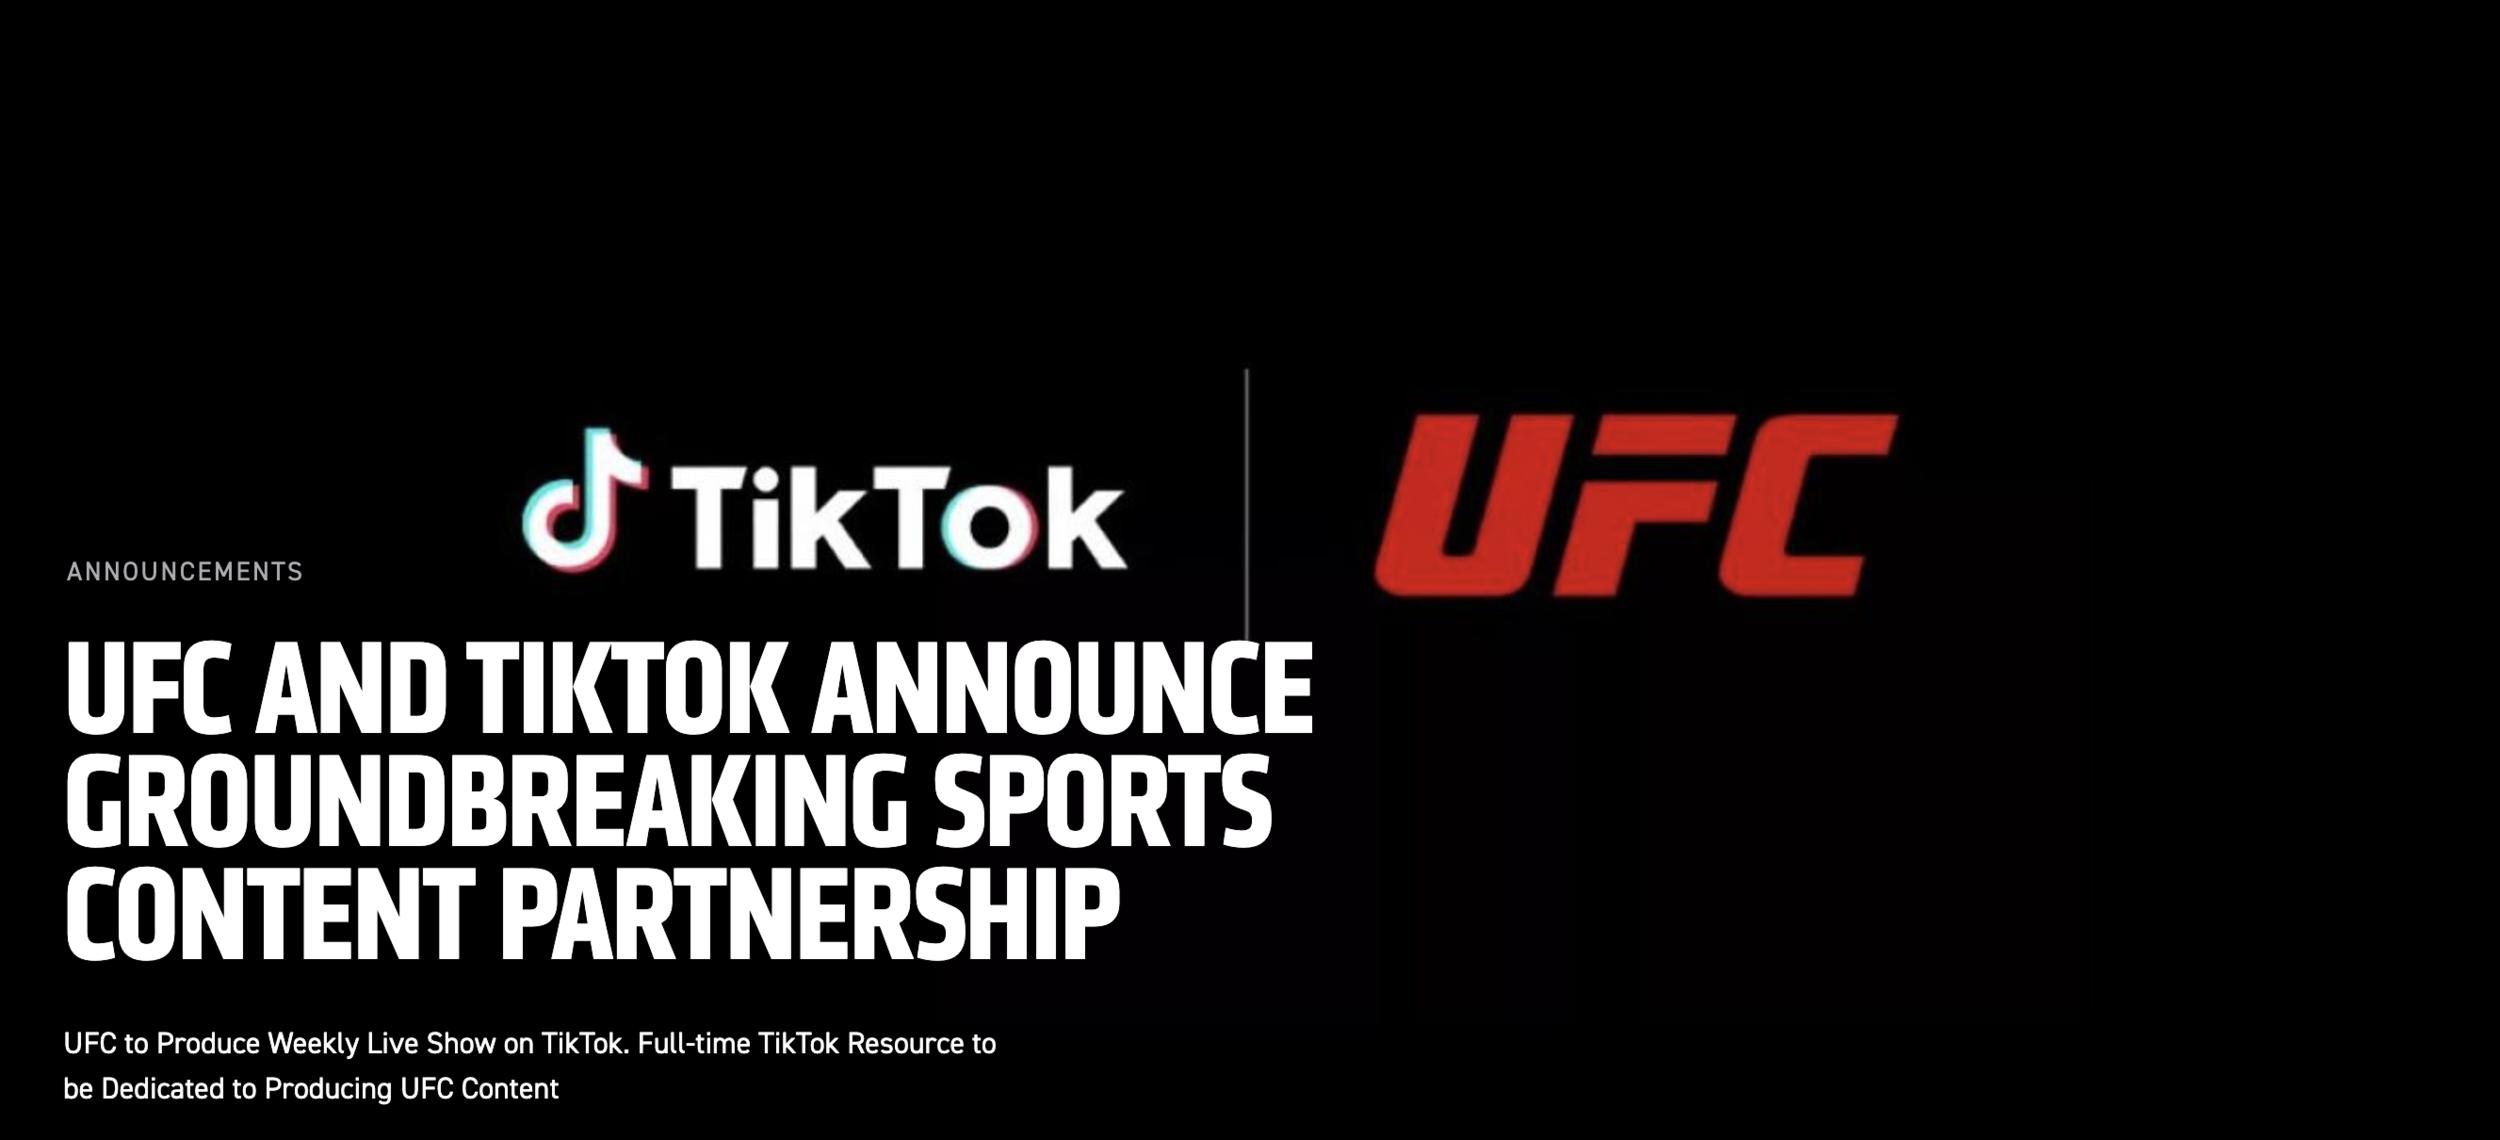 UFC+AND+TIKTOK+ANNOUNCE+GROUNDBREAKING+SPORTS+CONTENT+PARTNERSHIP-2